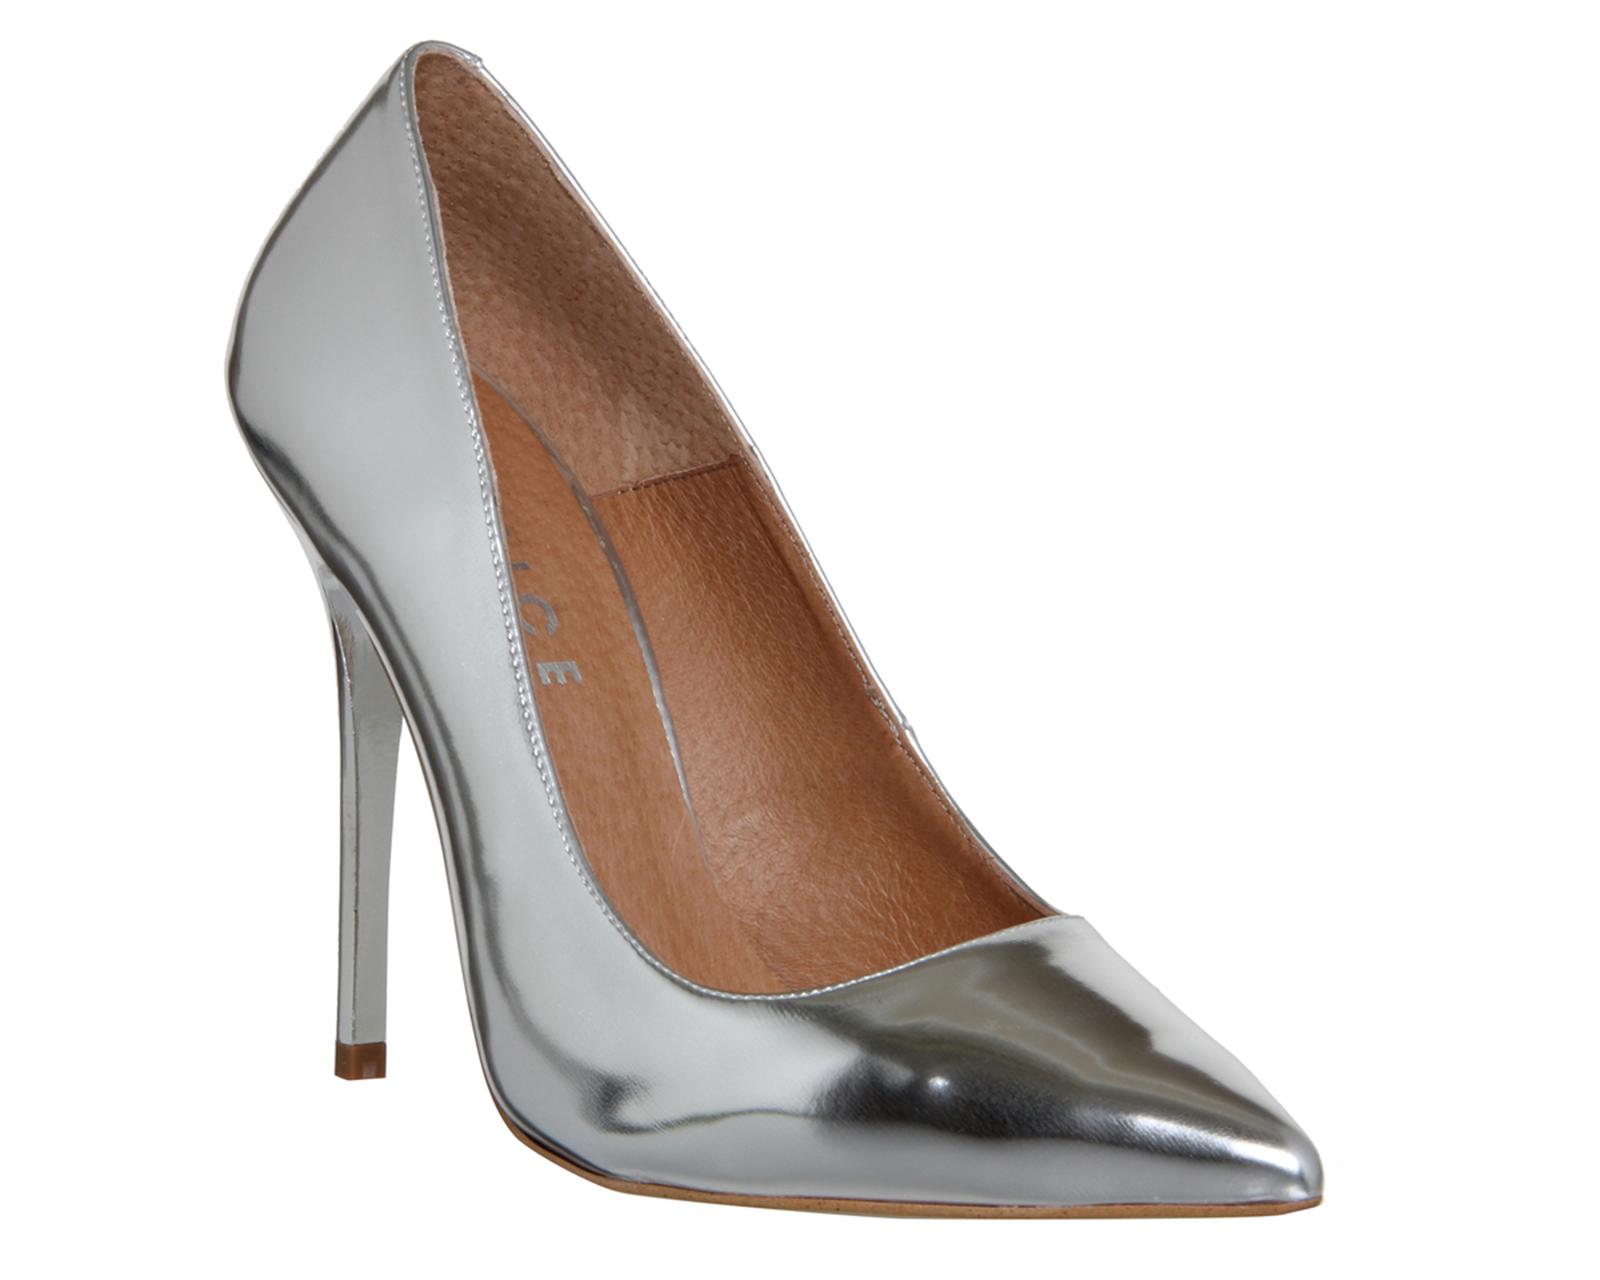 afa040c8250 Womens OFFICE On Tops Silver Mirror Court Shoe Heels - UK Size 6 .